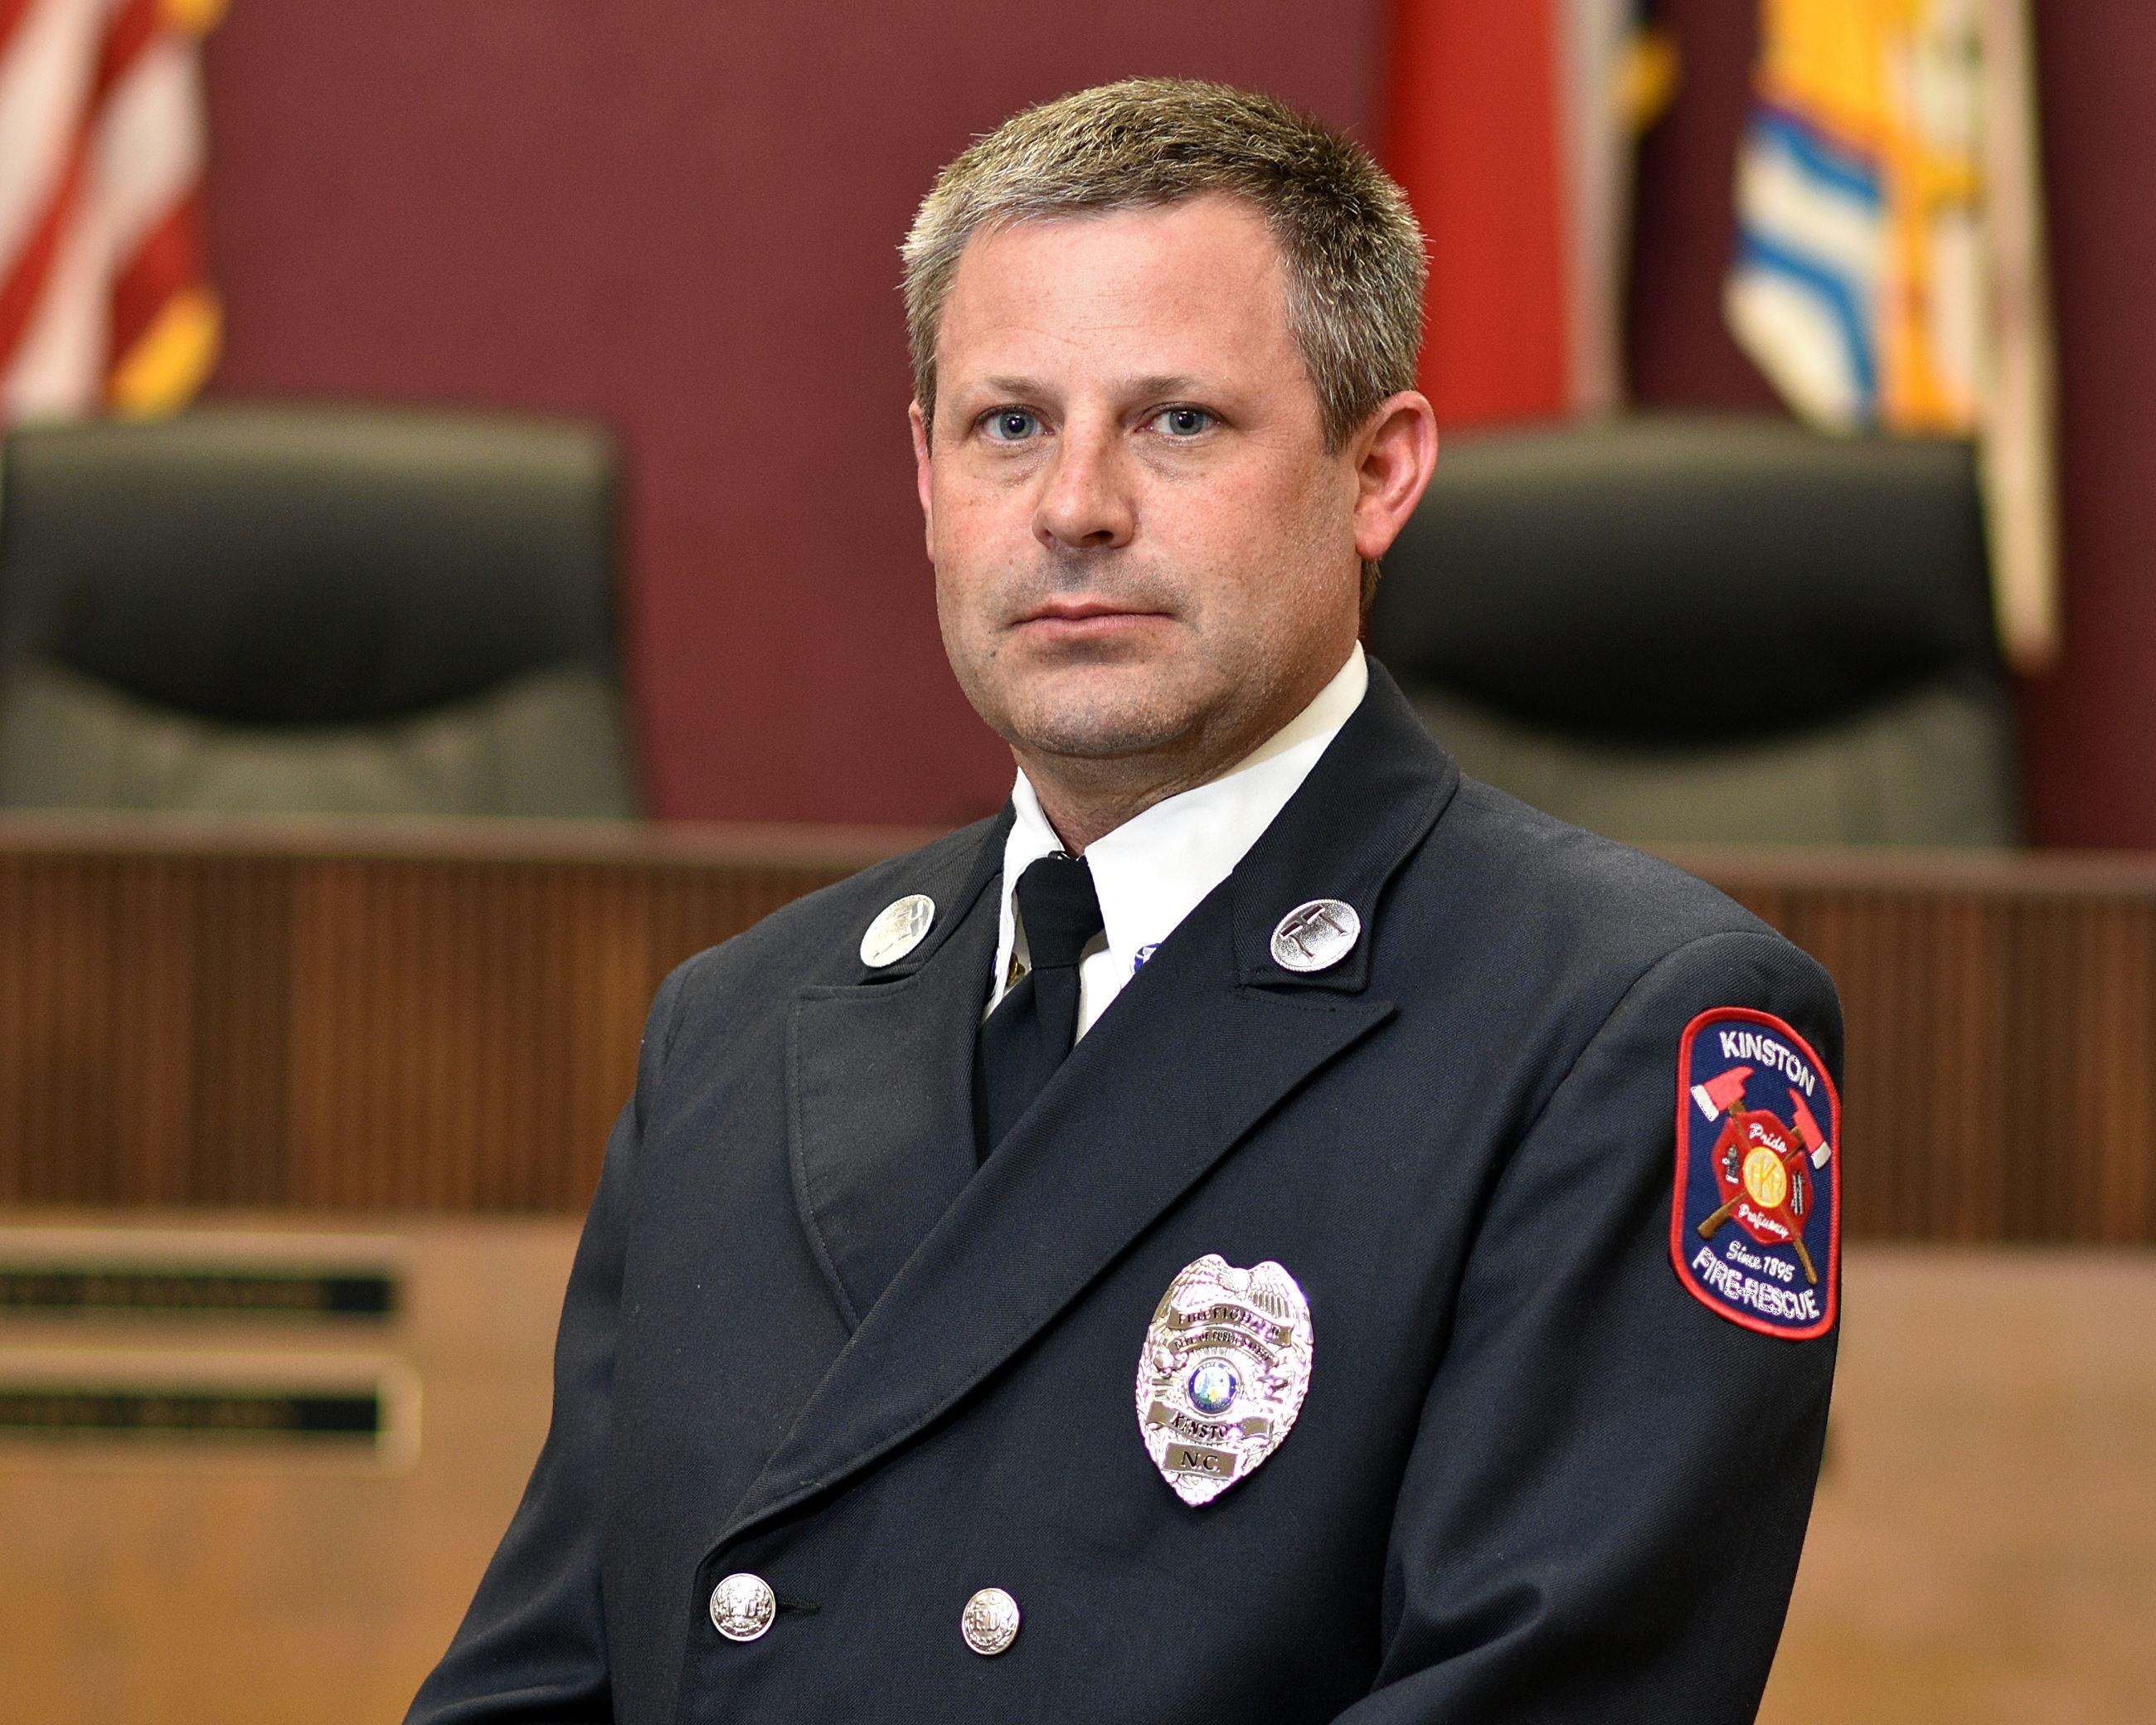 Fire Control Specialist II J. C. Pearson